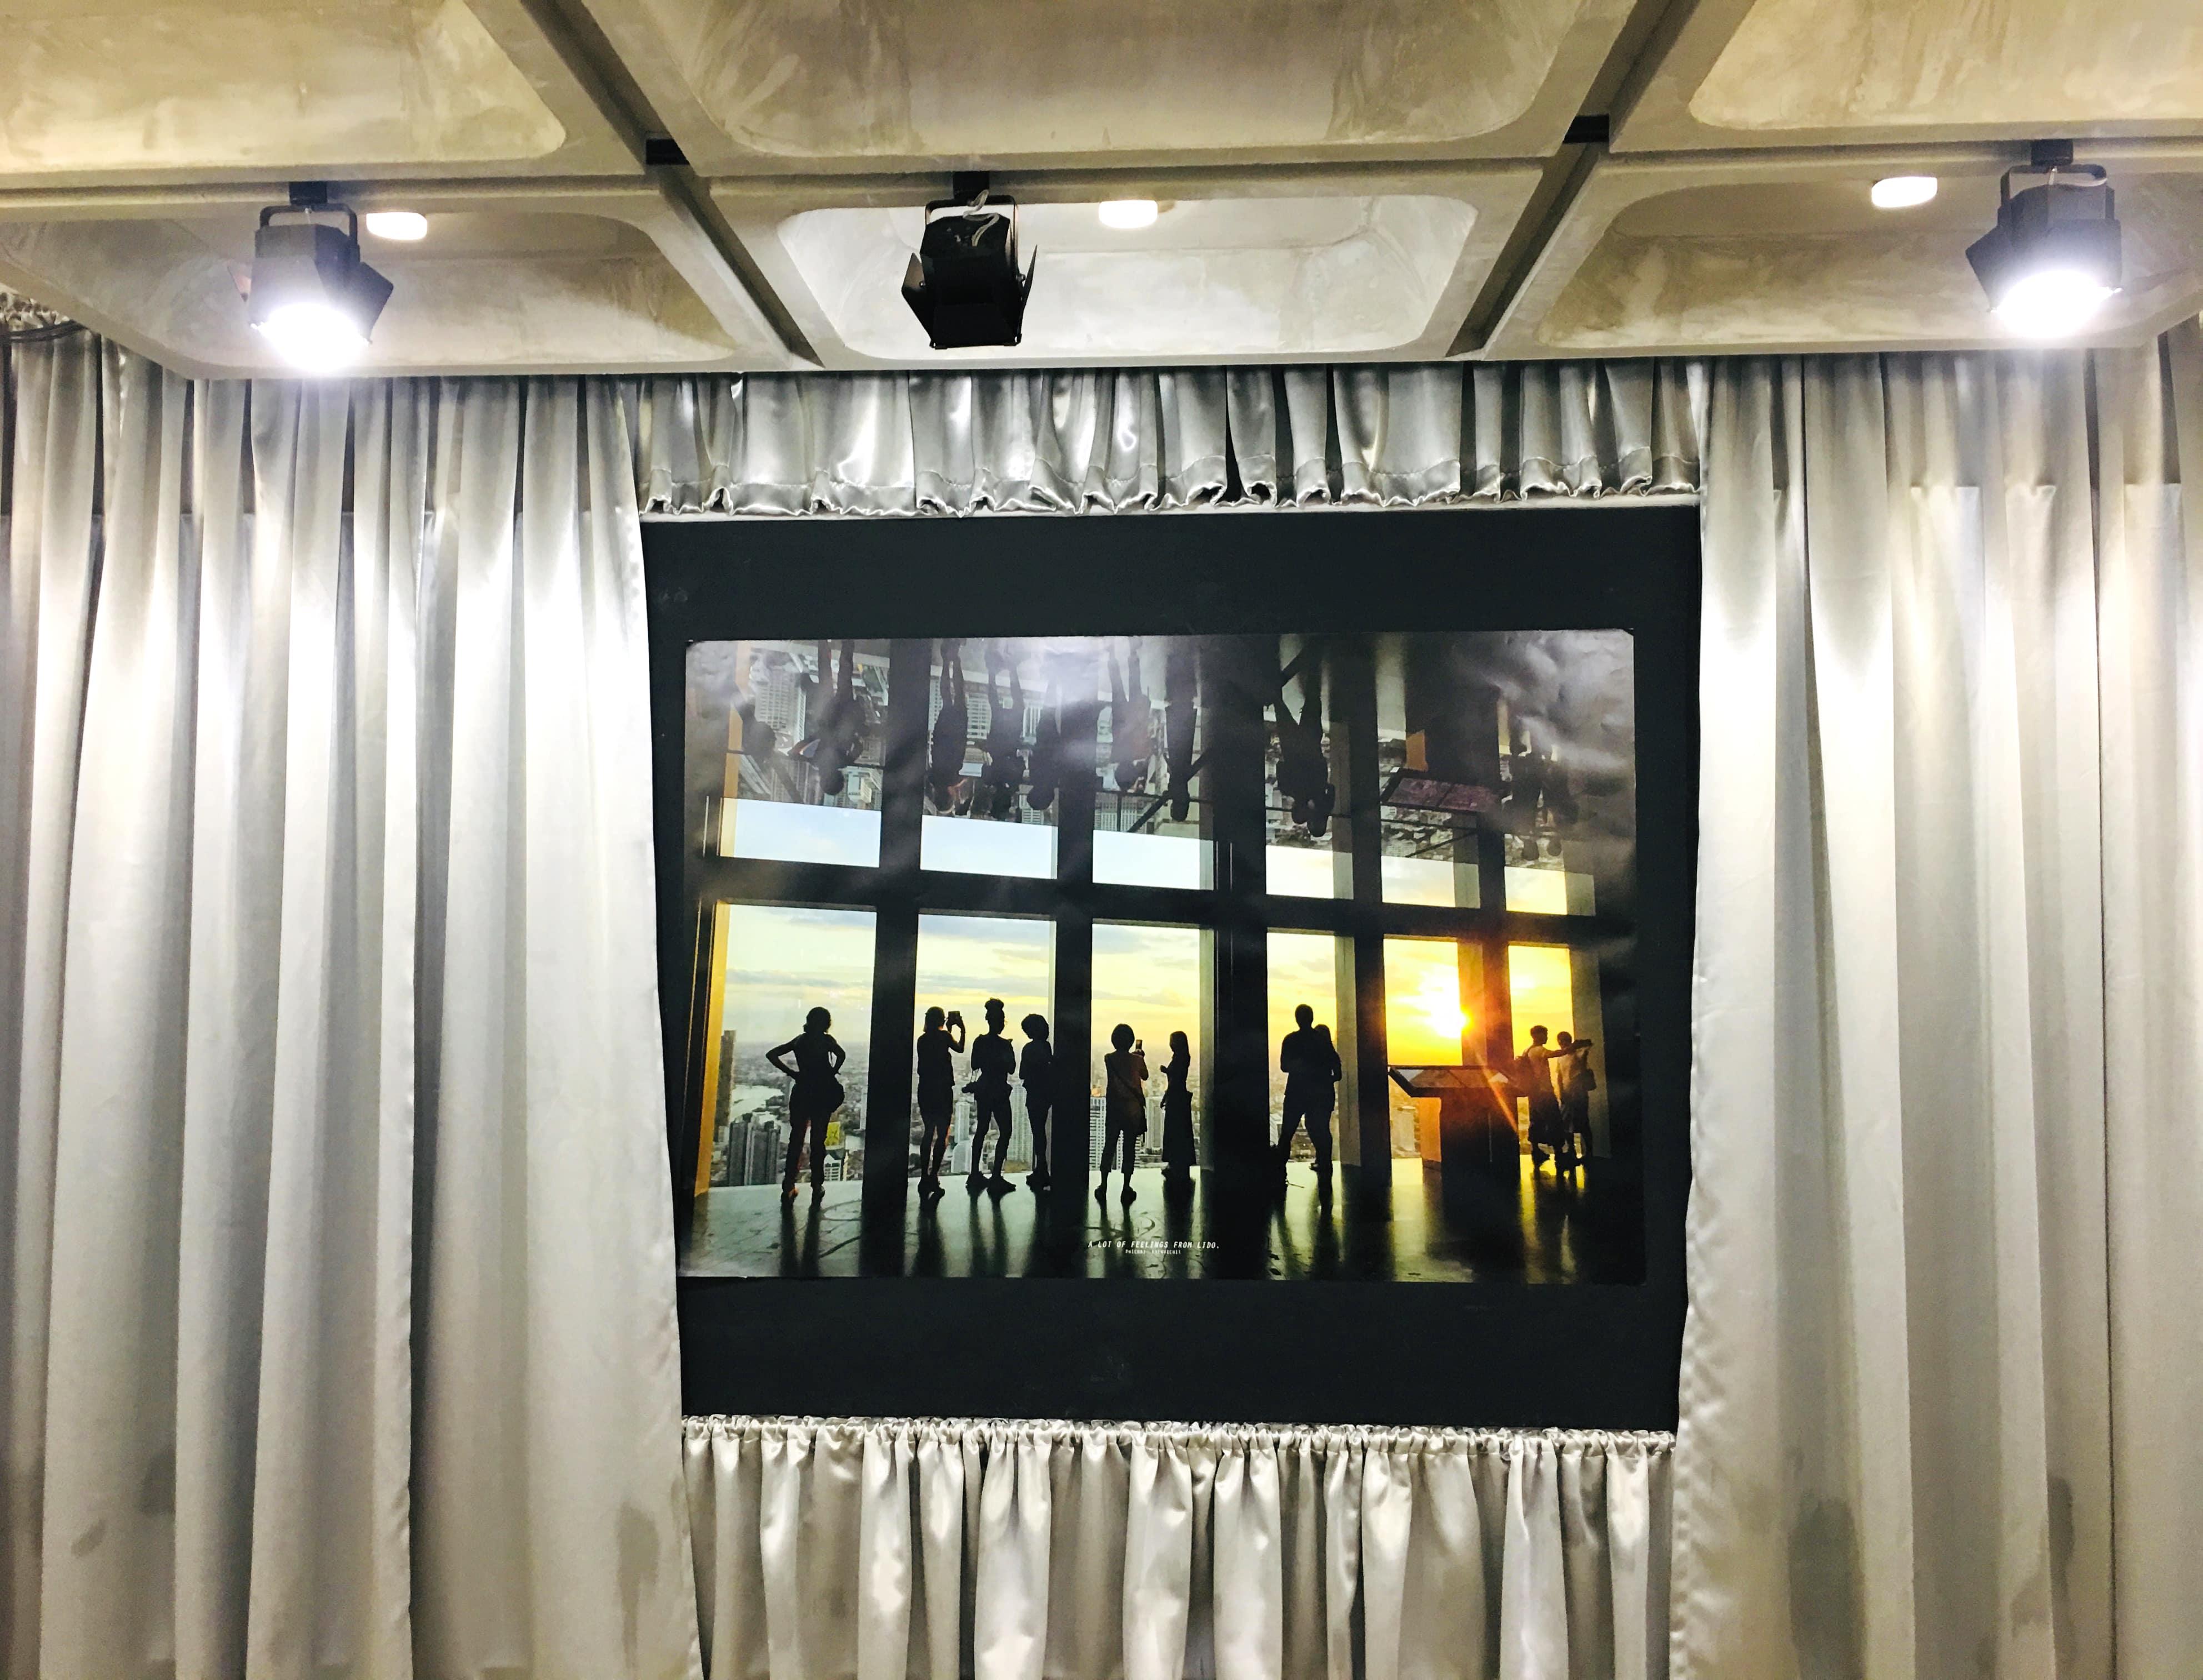 Lido Connect, Lido Theatre, Lido Cinema, Siam Square, Siam, revamped Lido Connect, Art gallery, Instagram worthy backdrop, Instgrammable, artsy backdrop, Lido backdrop